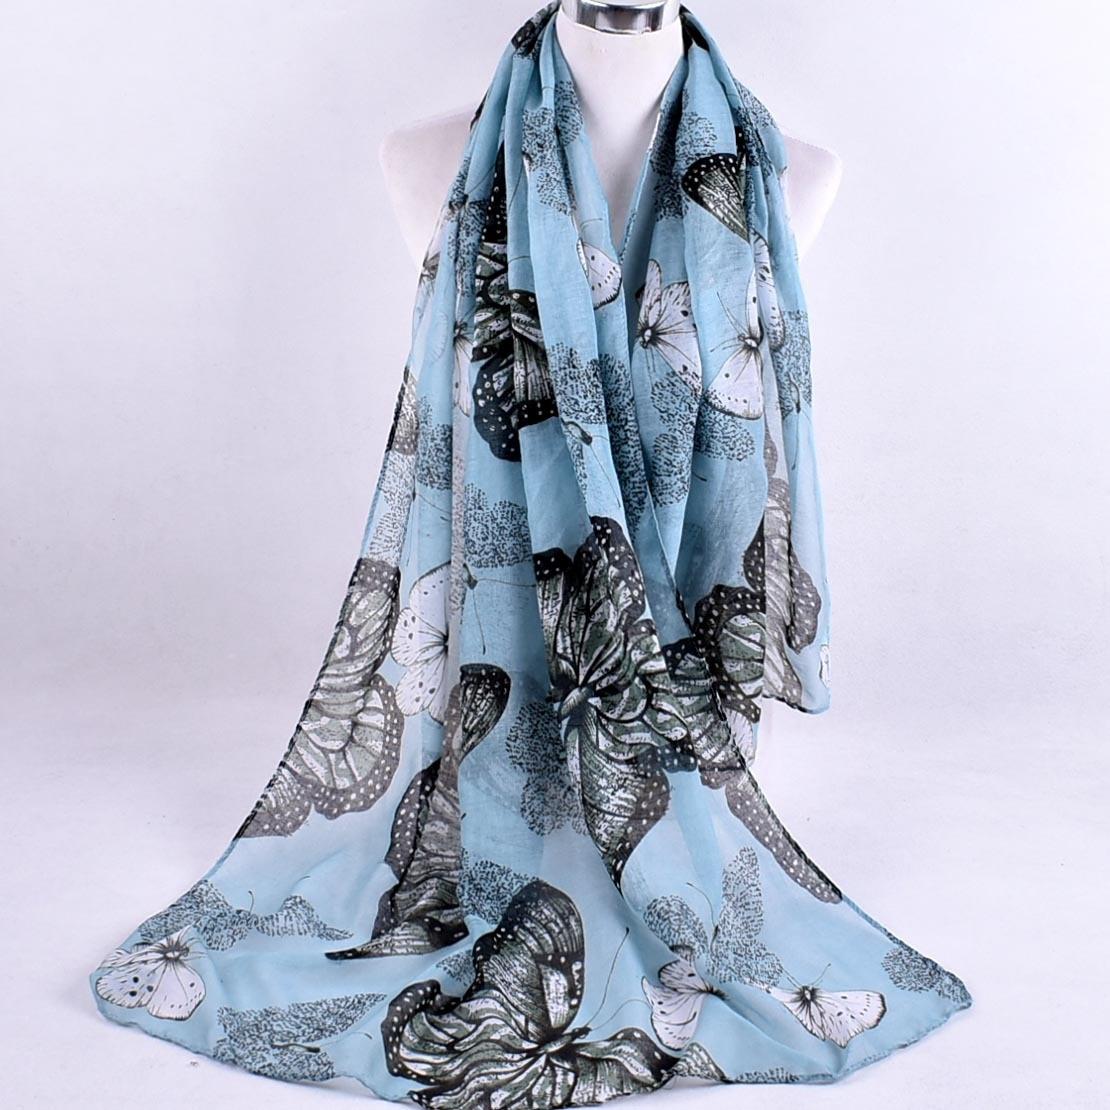 2019 Autumn Winter Fashion Retro Floral Viscose Shawl Scarf Ladies Print Voile Wrap Pashmina Stole Muslim Hijab Caps 180*90Cm